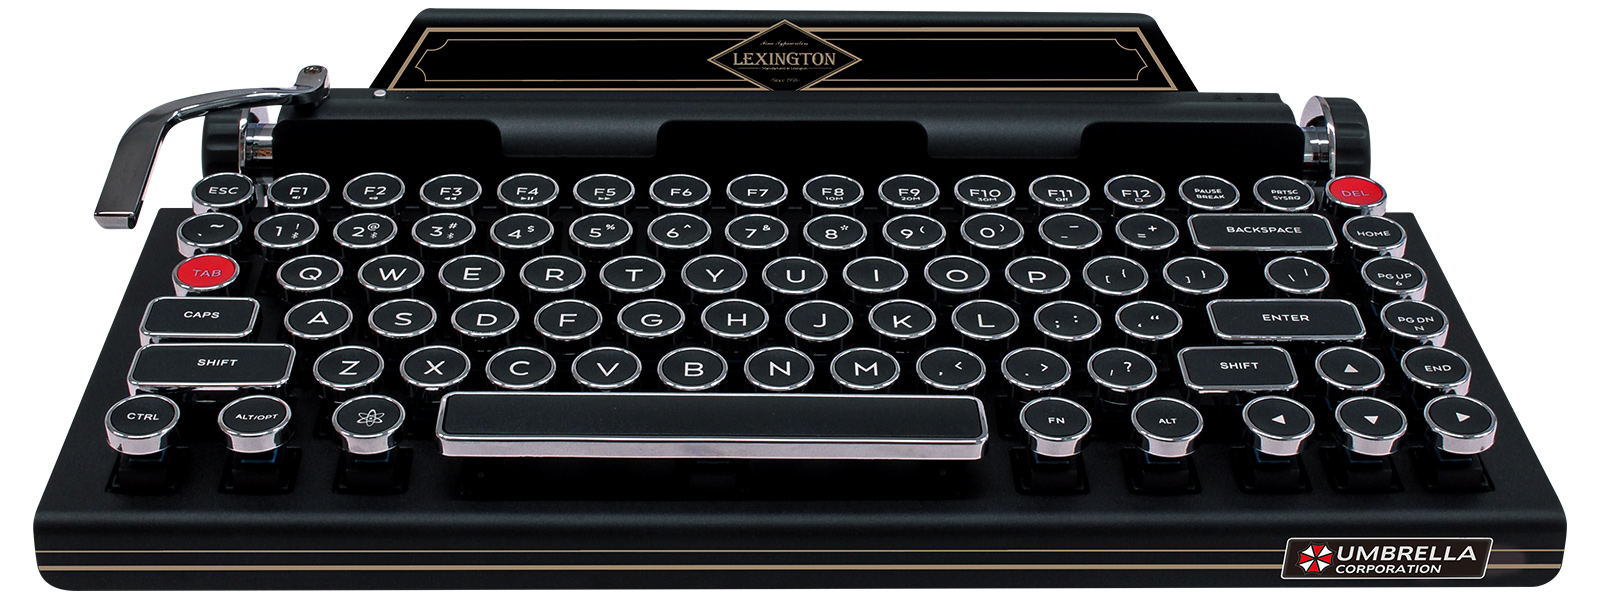 Capcom's typewriter-style keyboard for Resident Evil 2